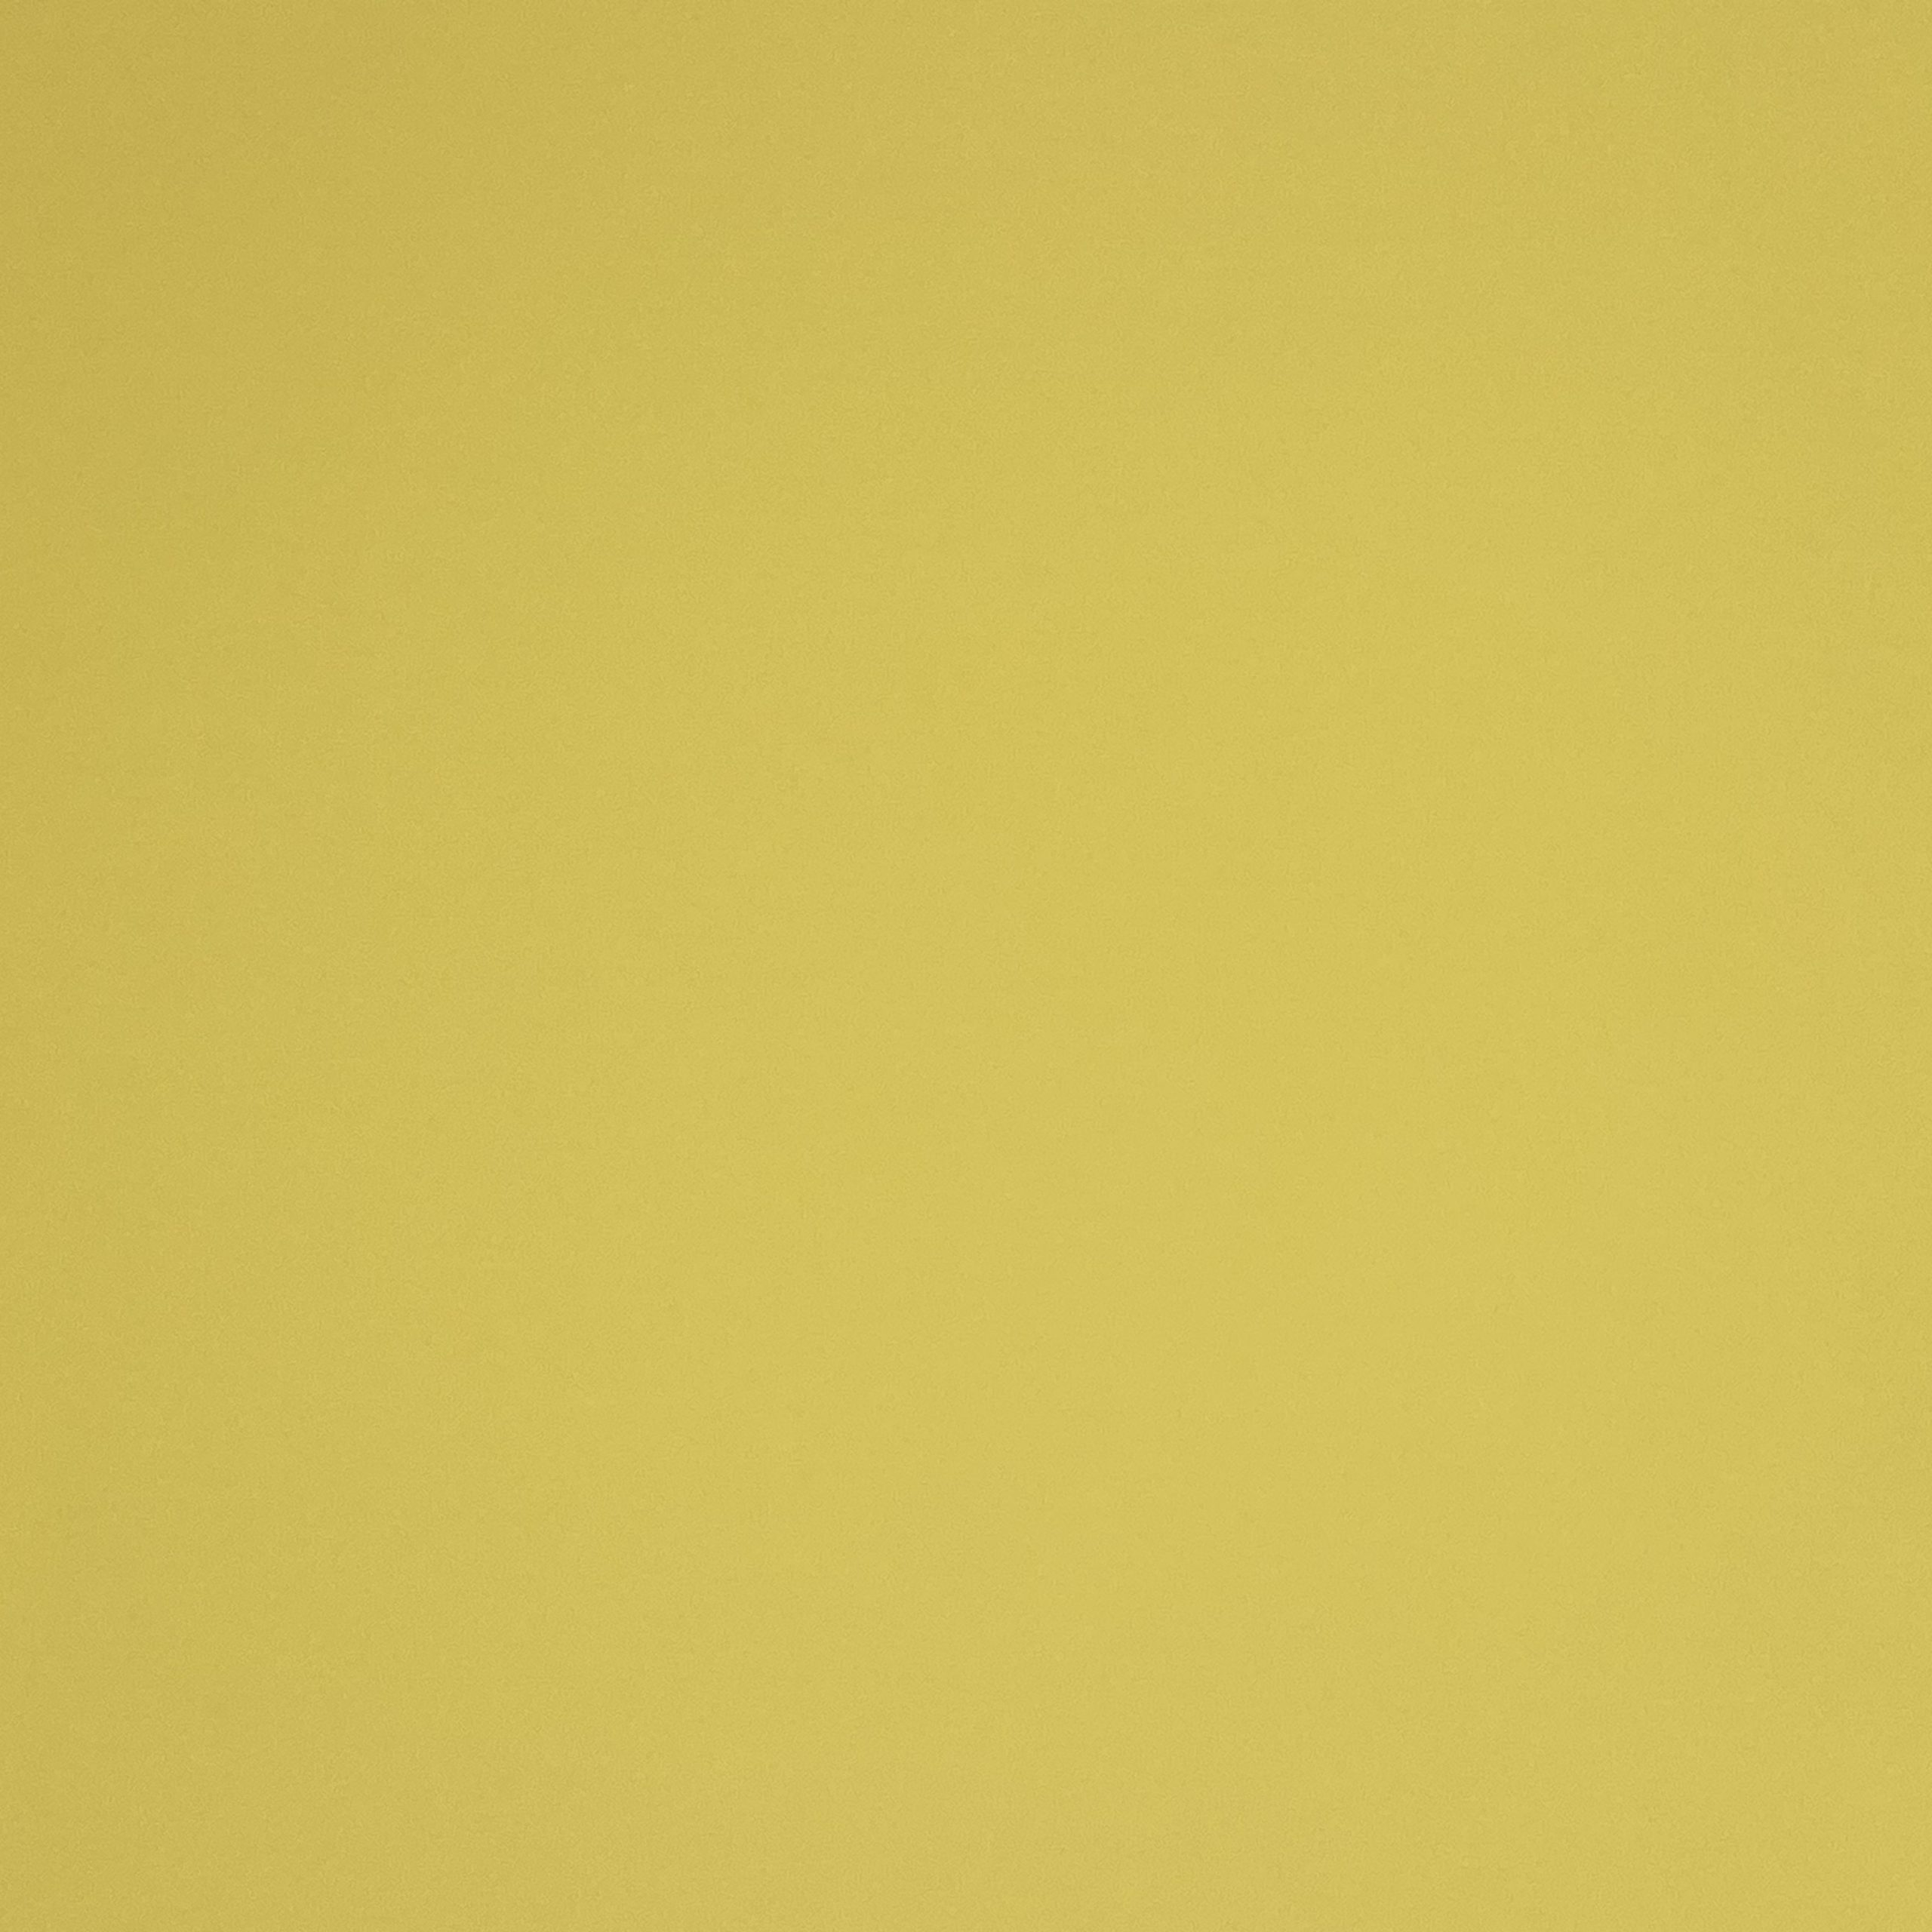 Cotton-Shakespear-Lemon-601